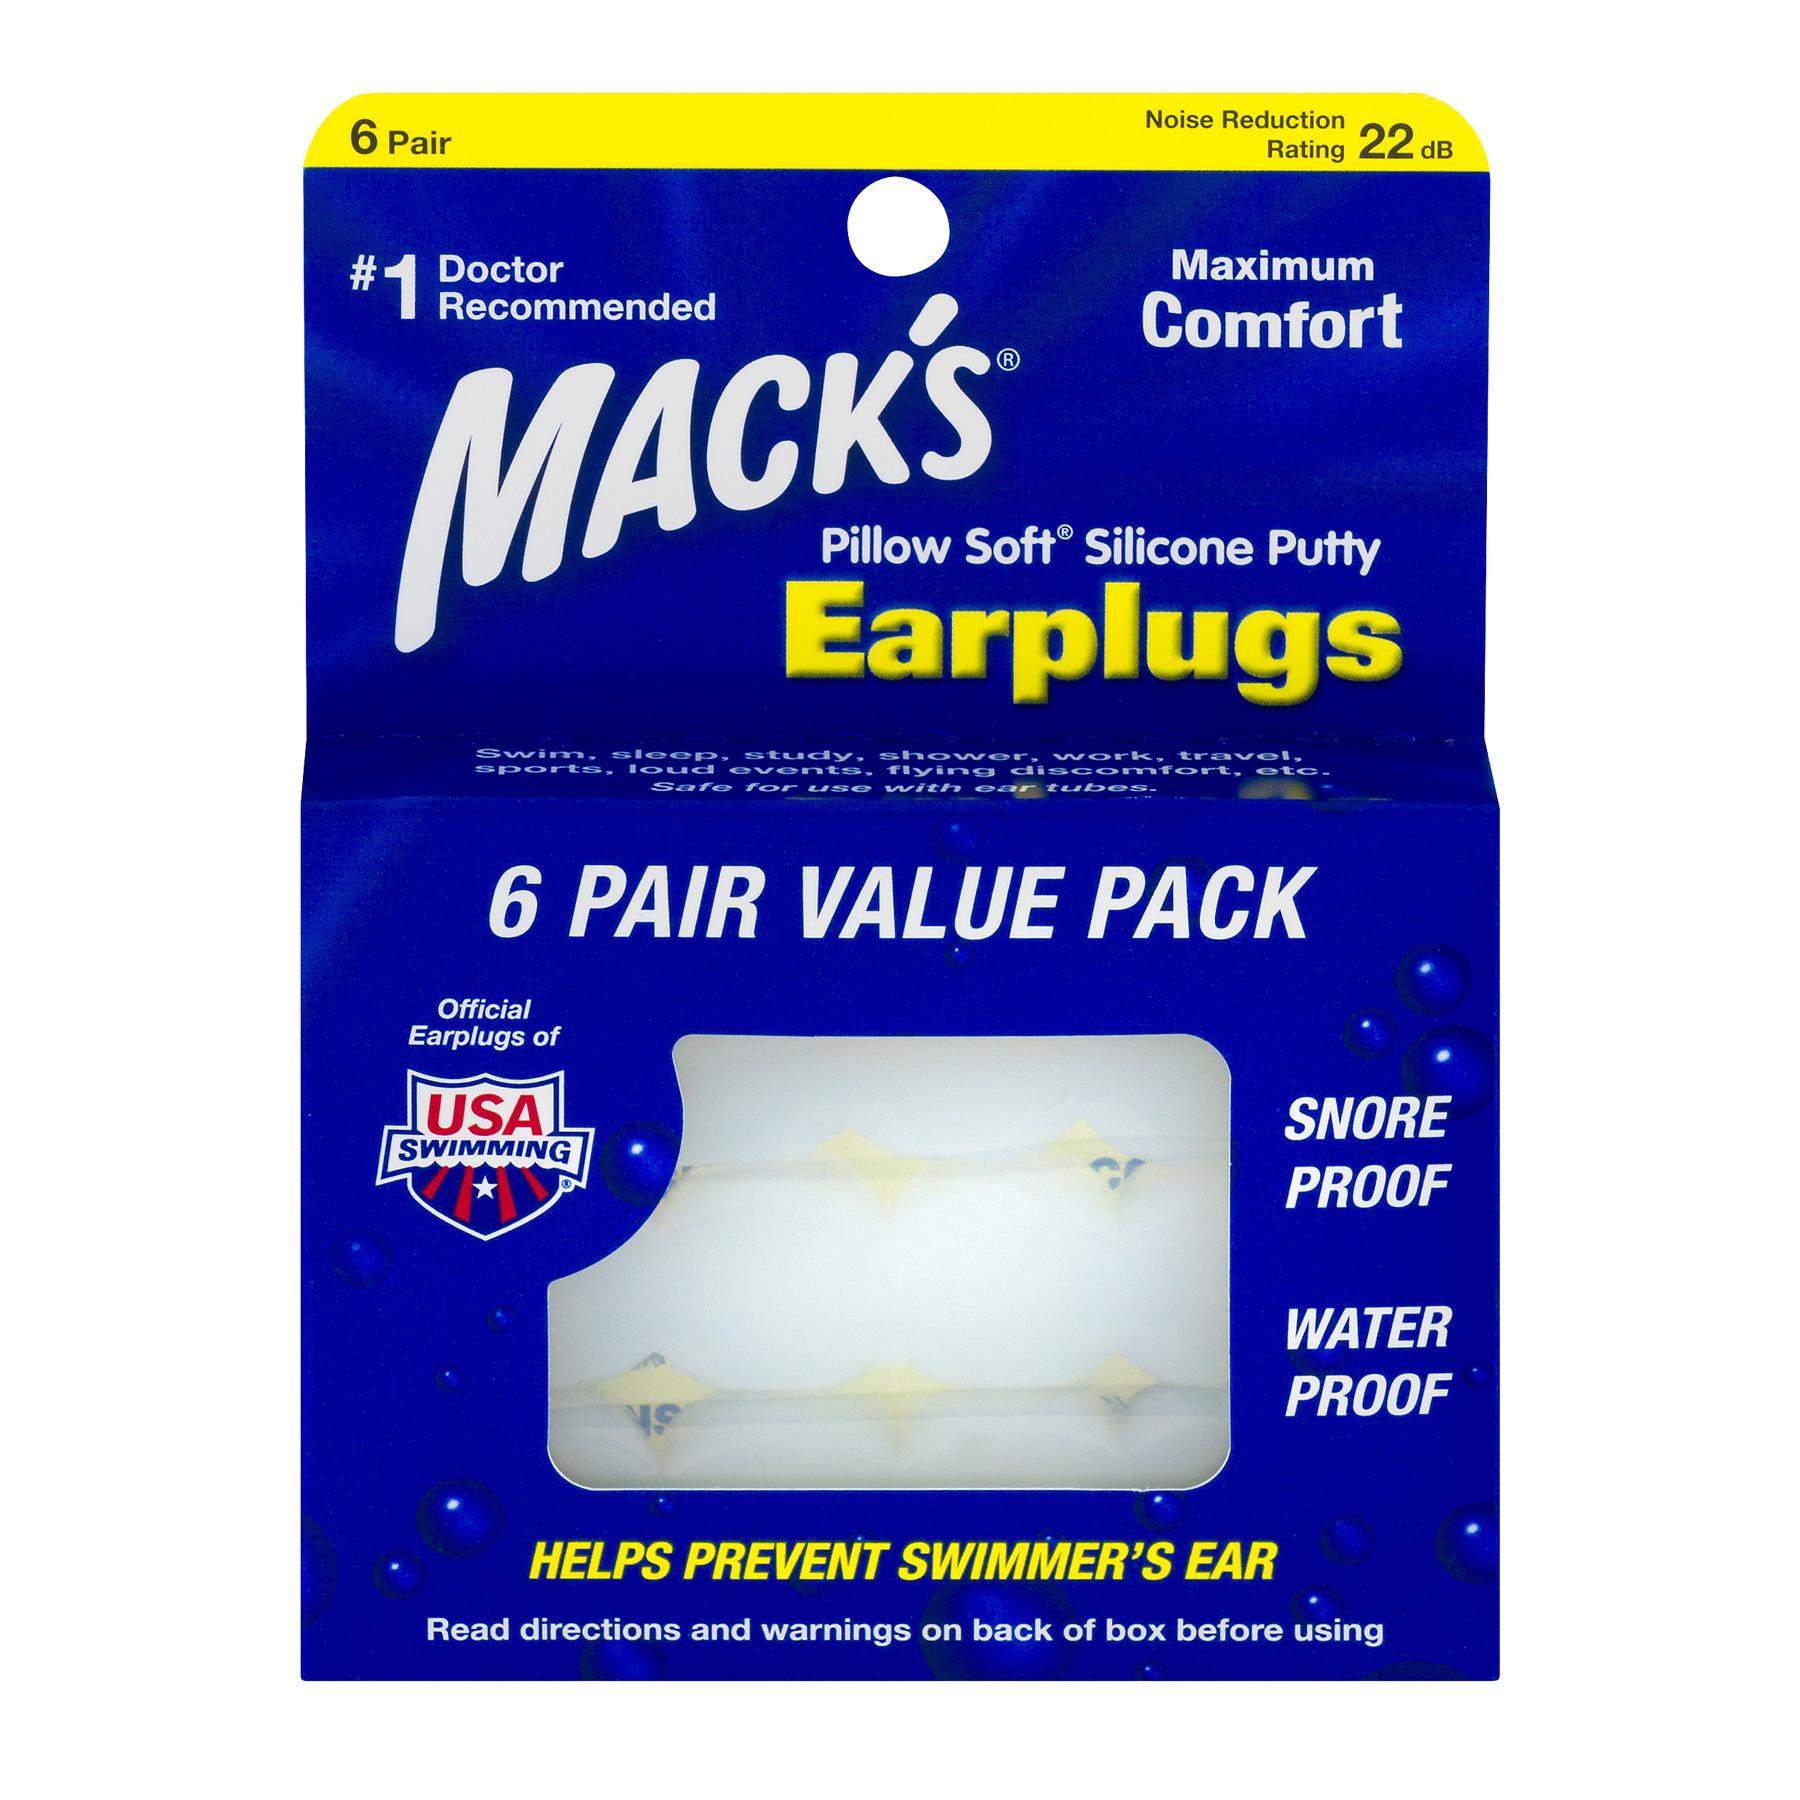 Mack's Pillow Soft Silicone Putty Earplugs - 6 PK, 6.0 CT